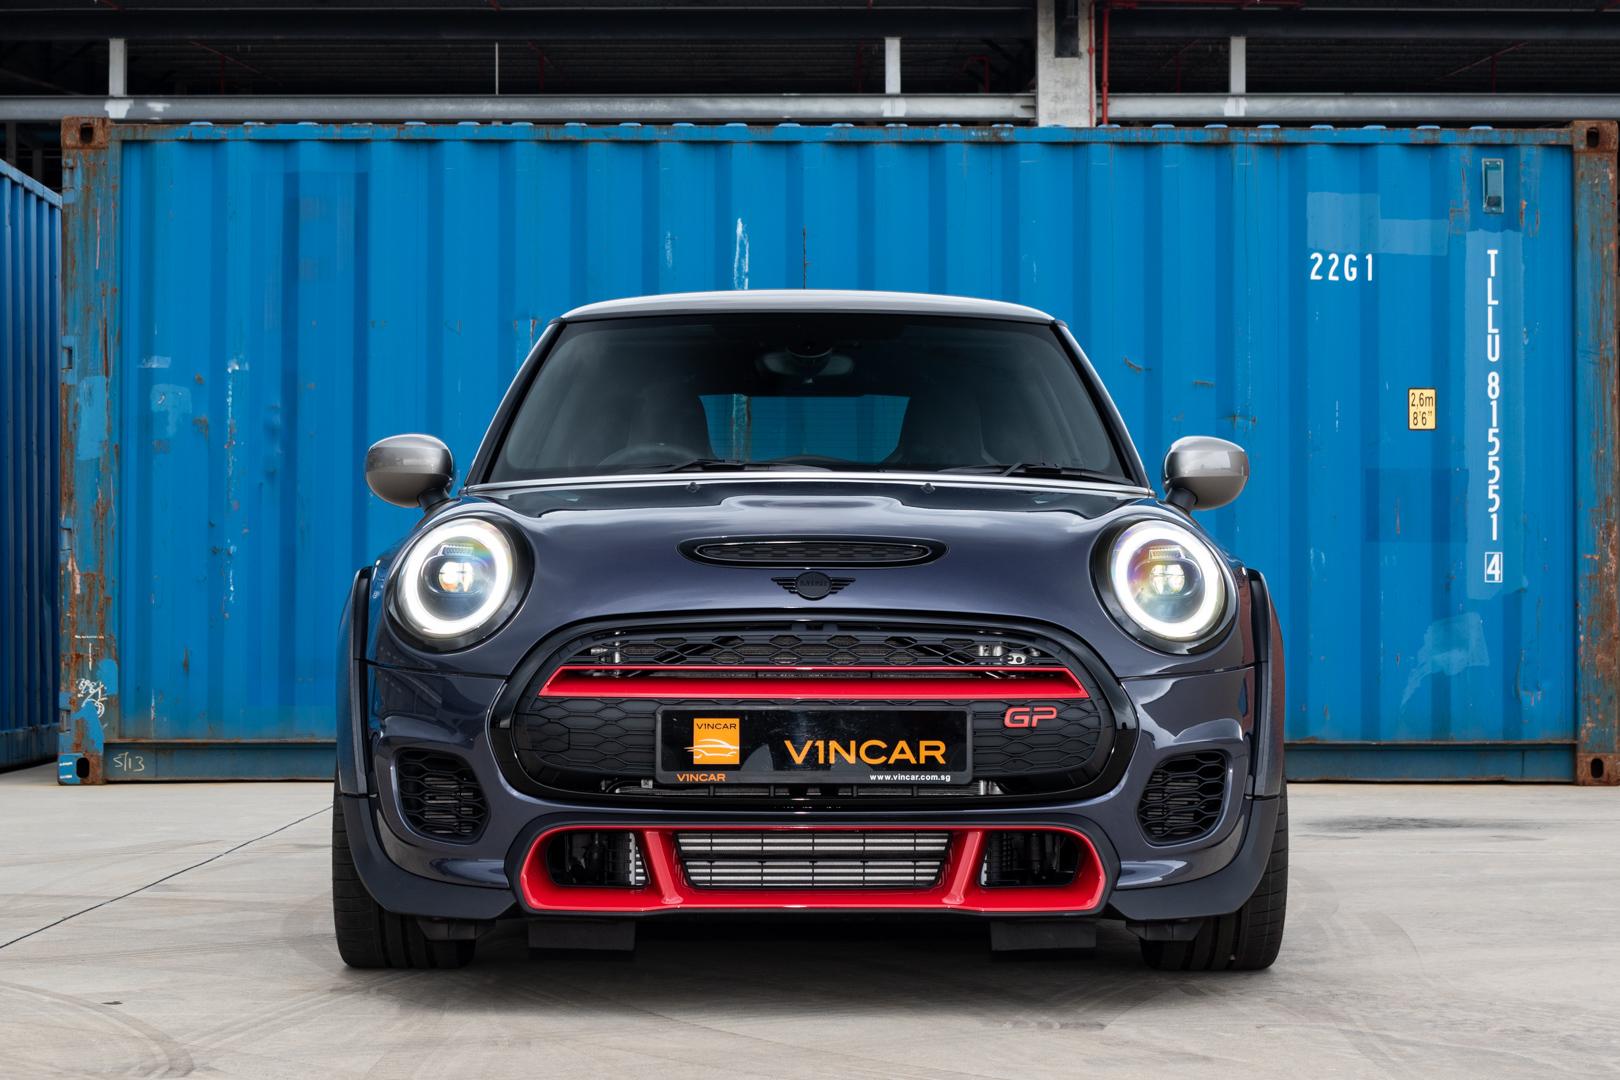 MINI JCW GP3 - Front Direct